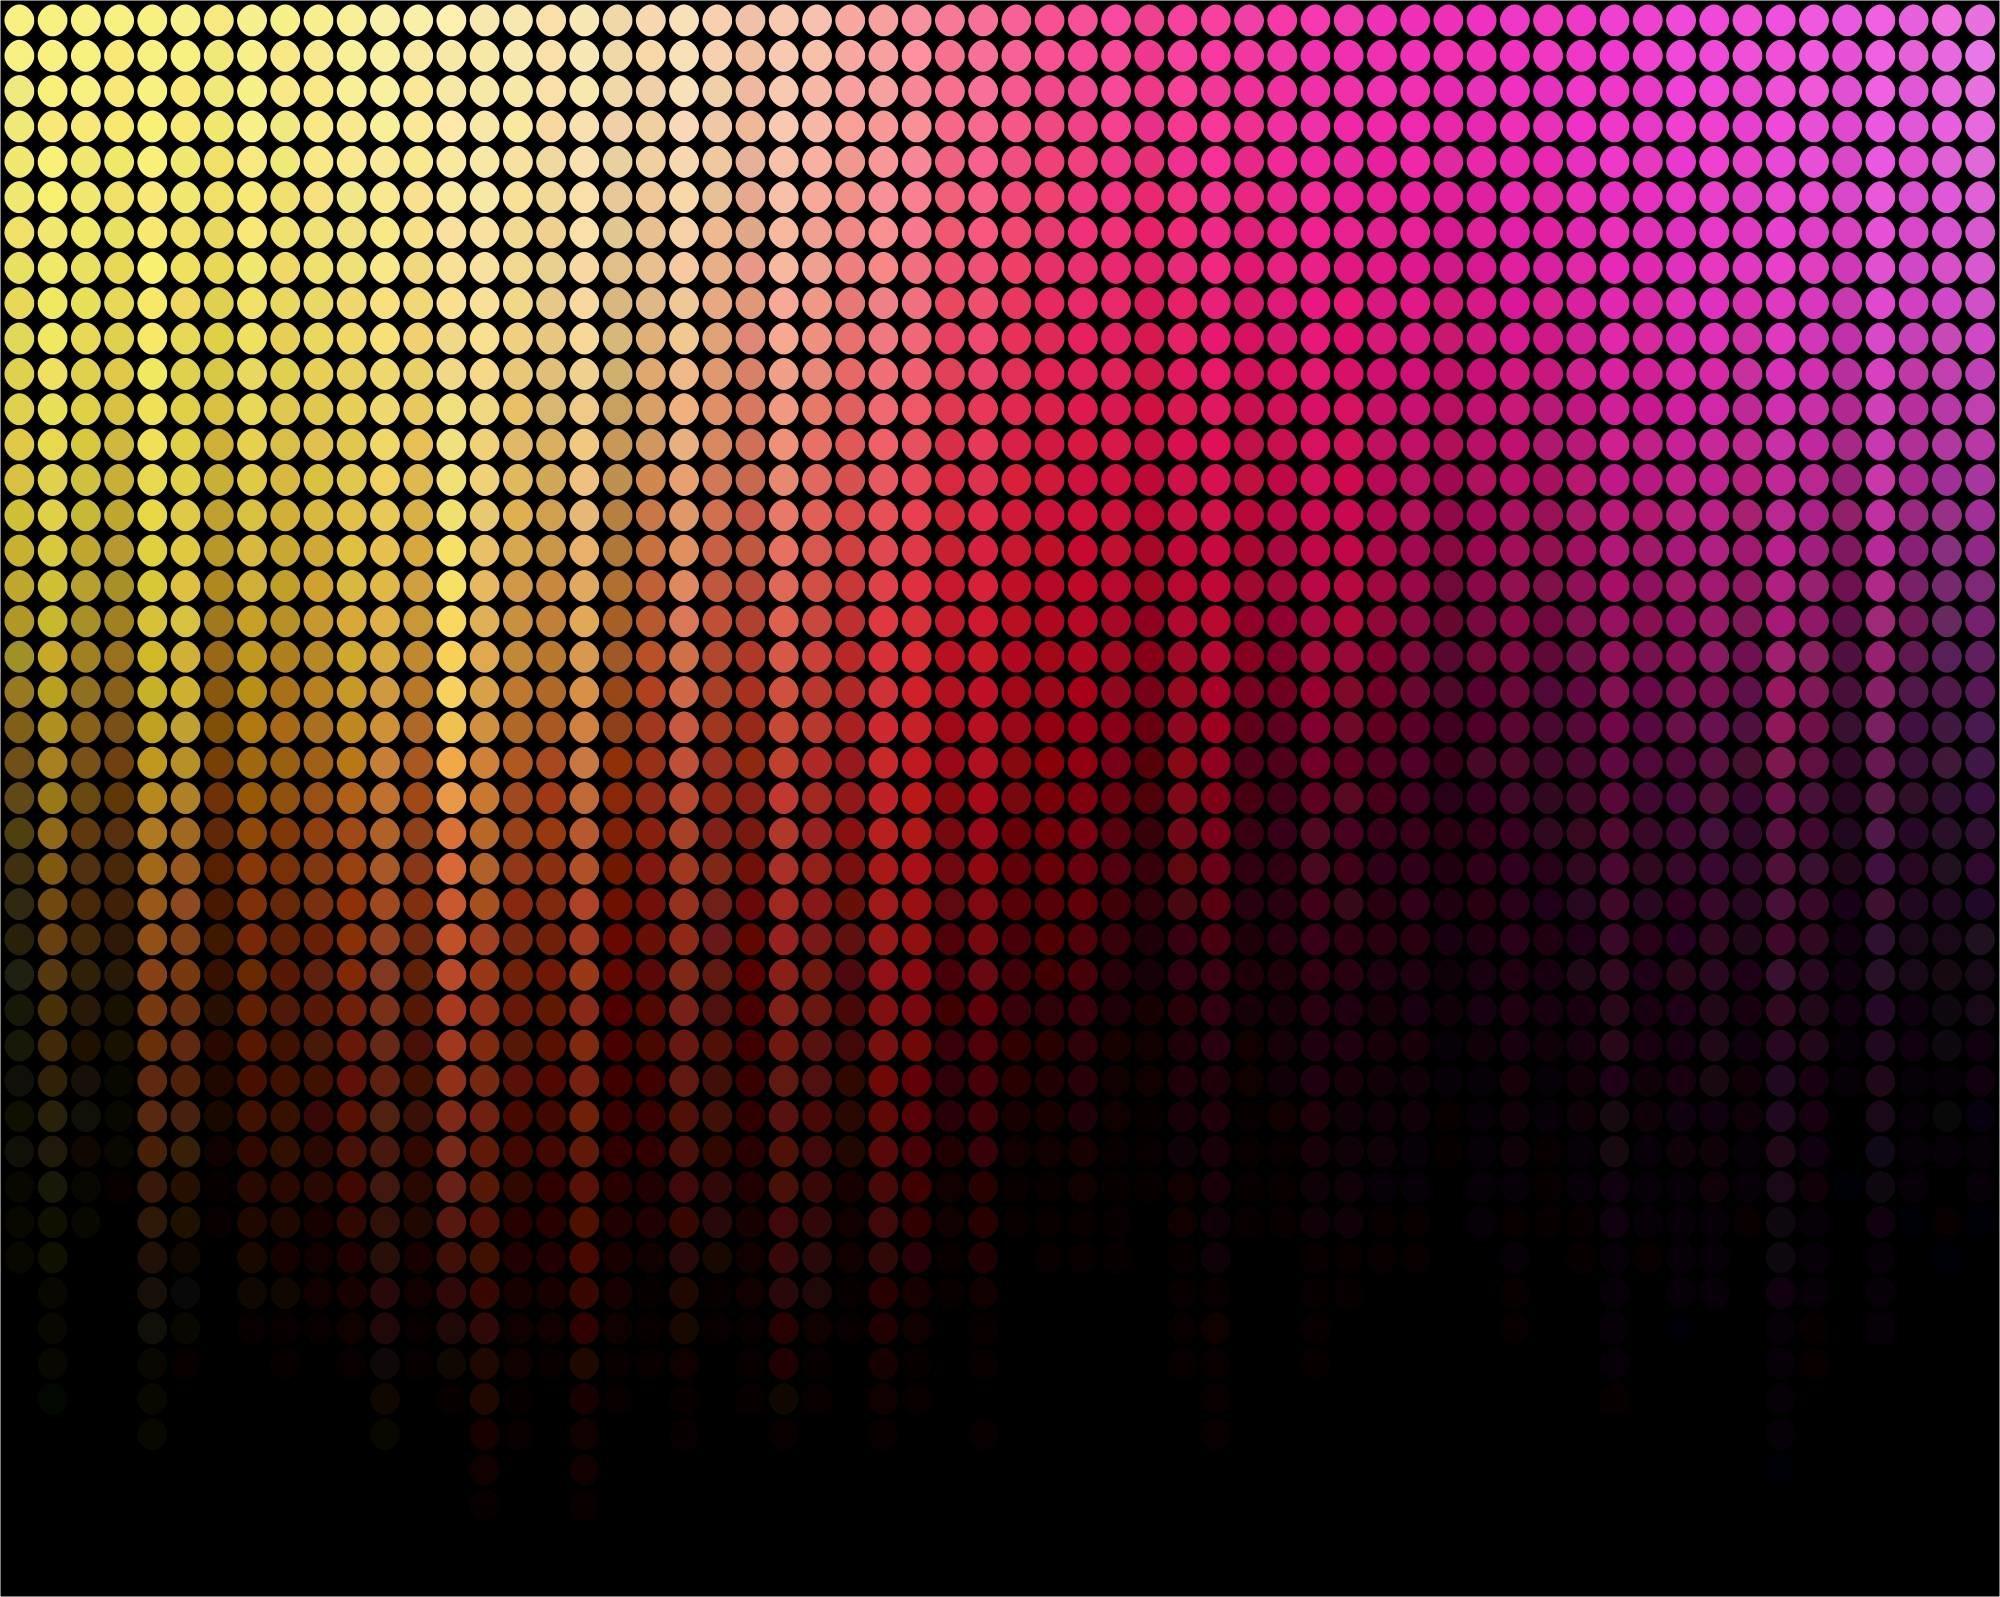 Brilliant neon color background image 07 vector Free Vector / 4Vector